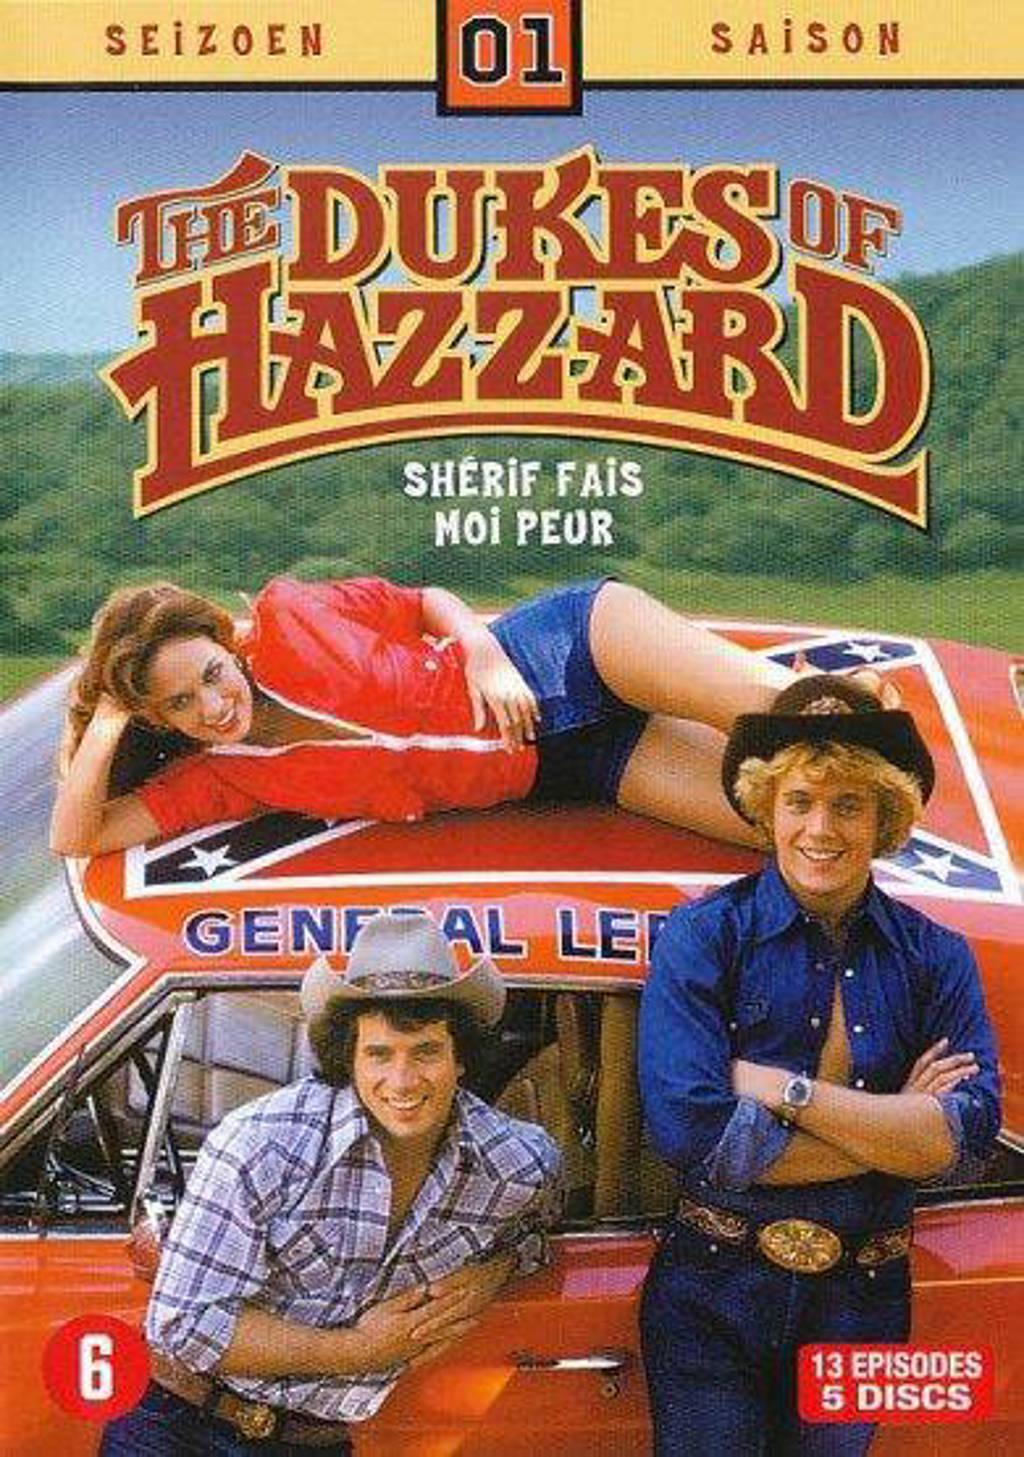 Dukes of Hazzard - Seizoen 1 (DVD)